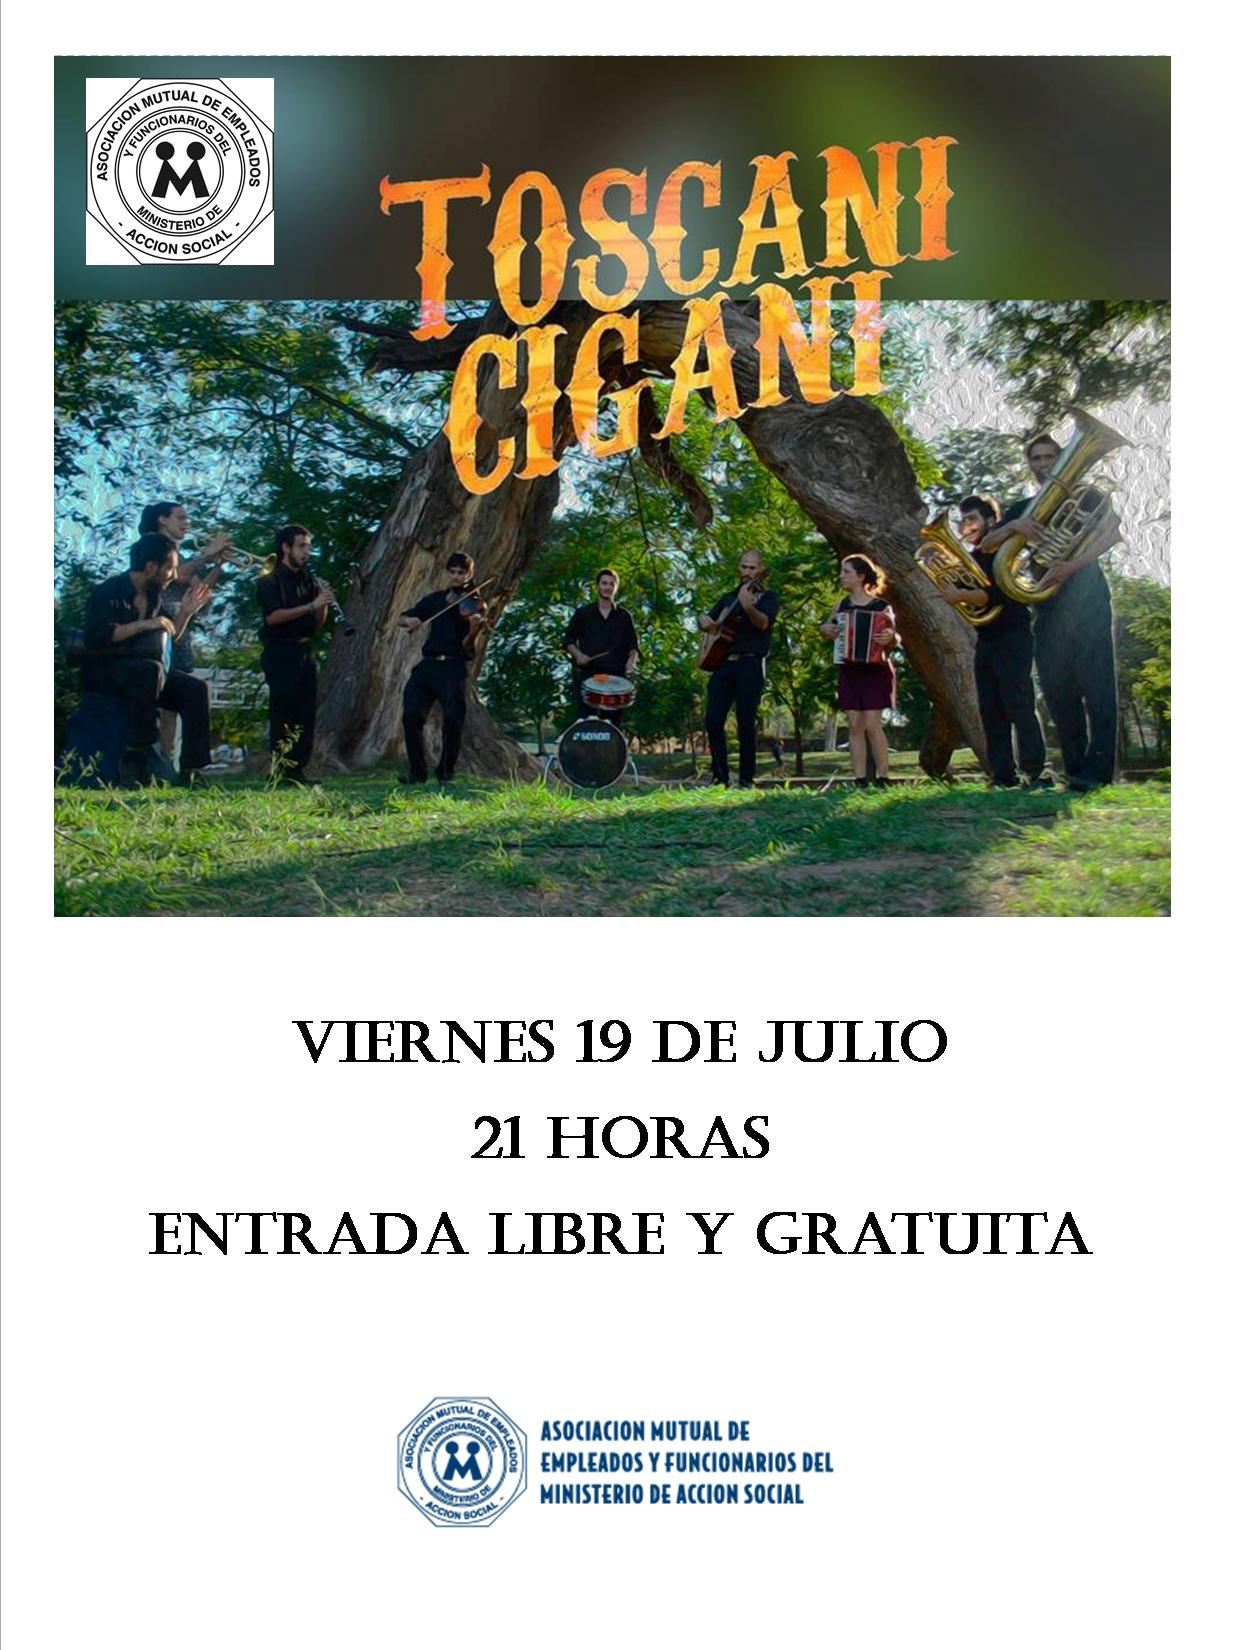 toscani-cigani-19-07-18